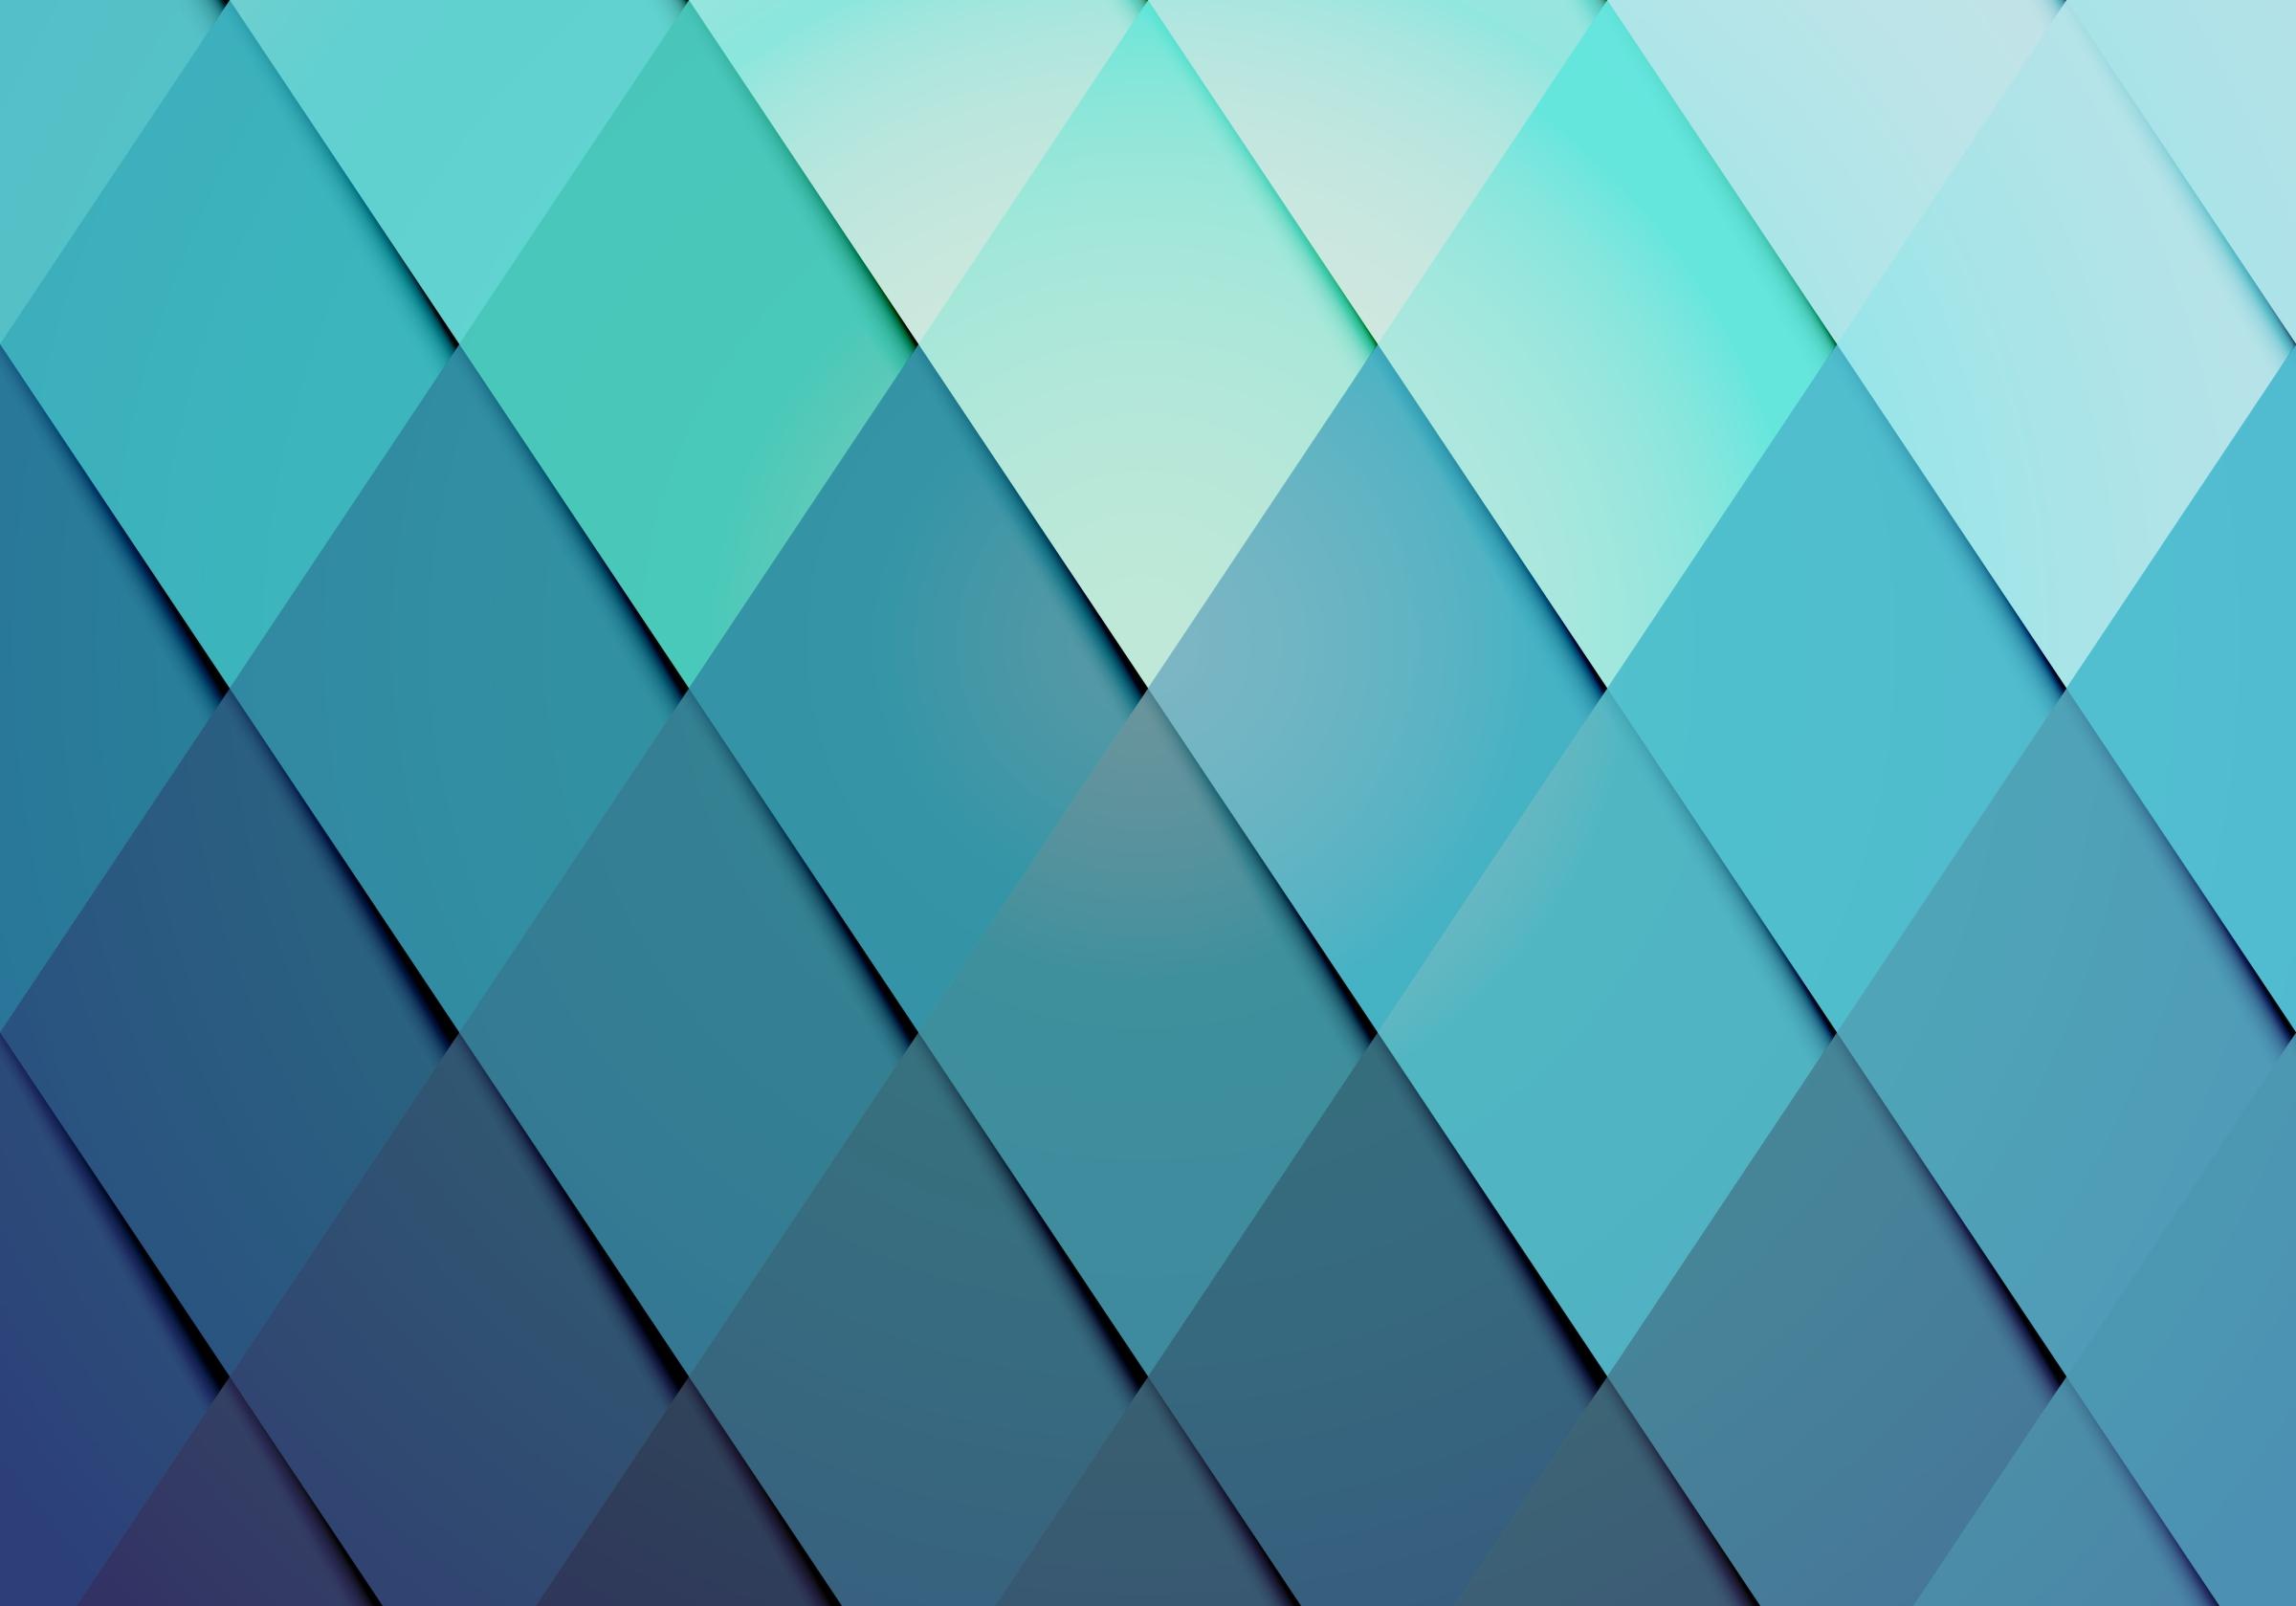 background teal diamonds